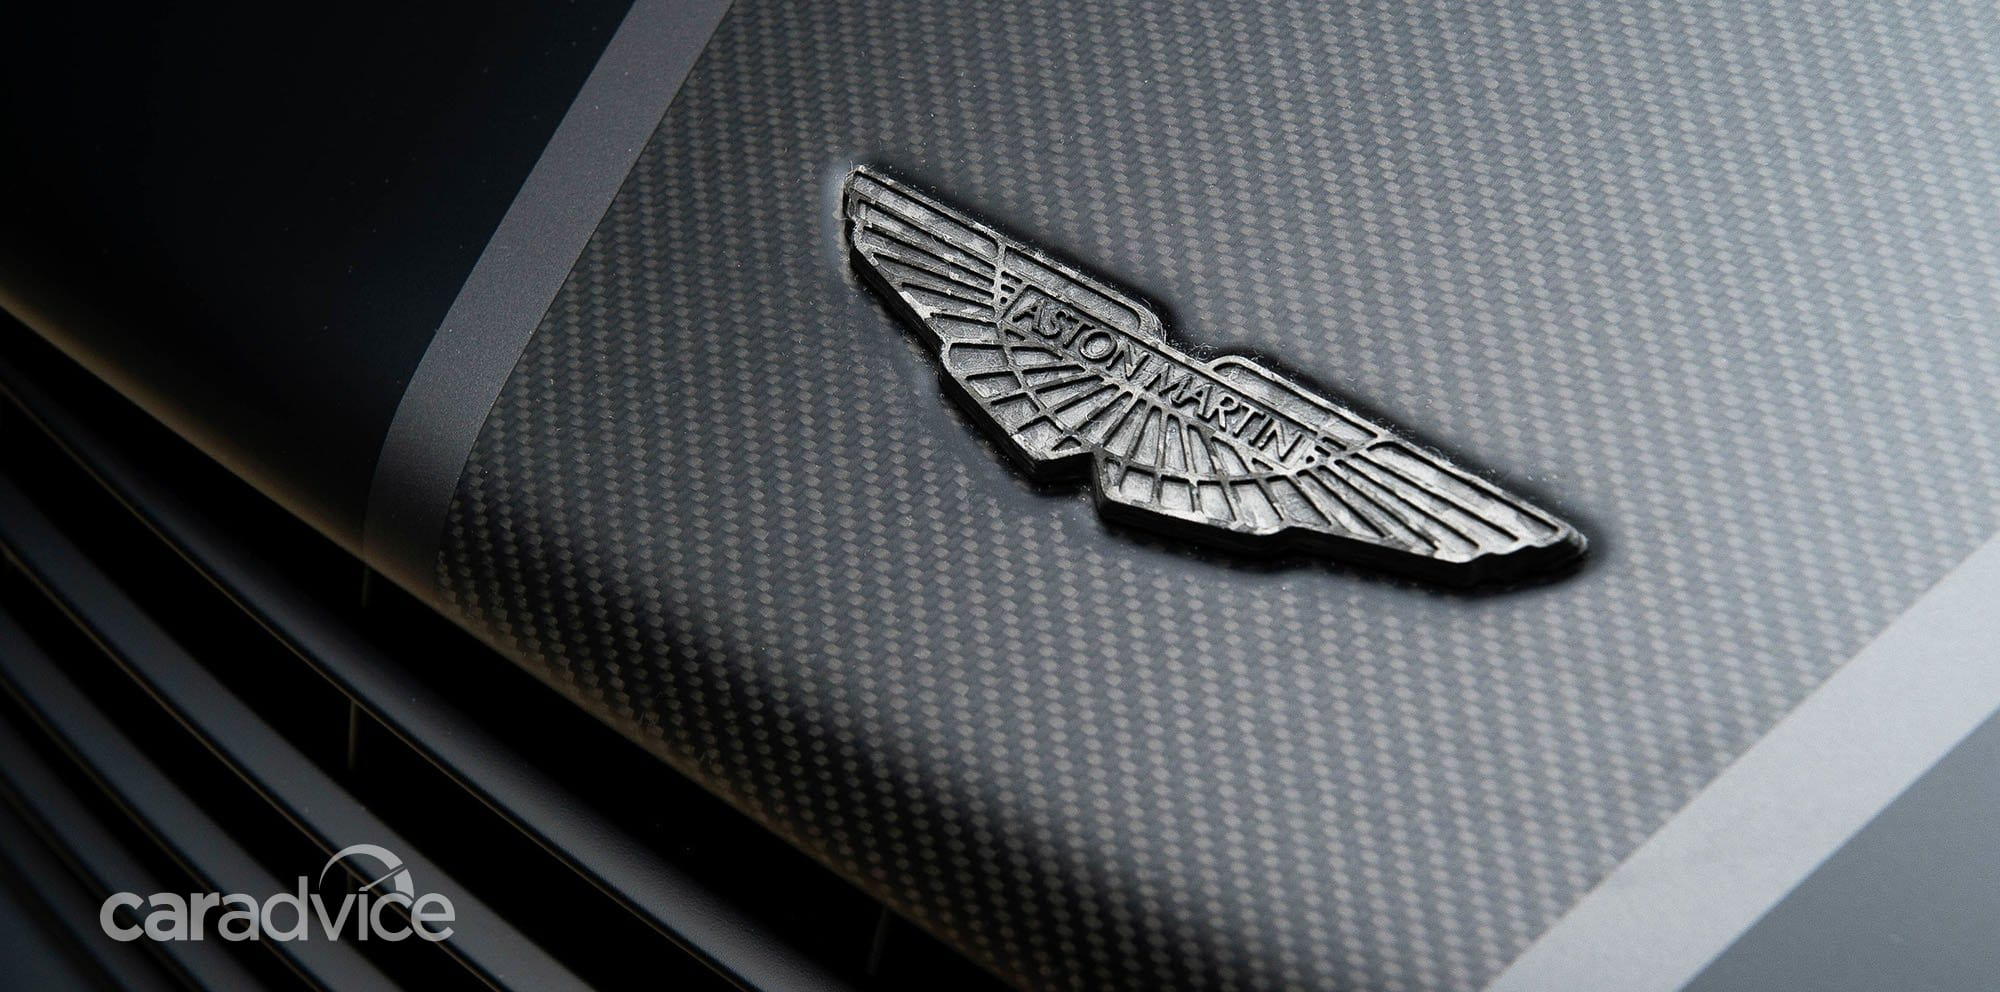 Aston Martin stocks rise and fall following Sebastian Vettel announcement - 1 of 2